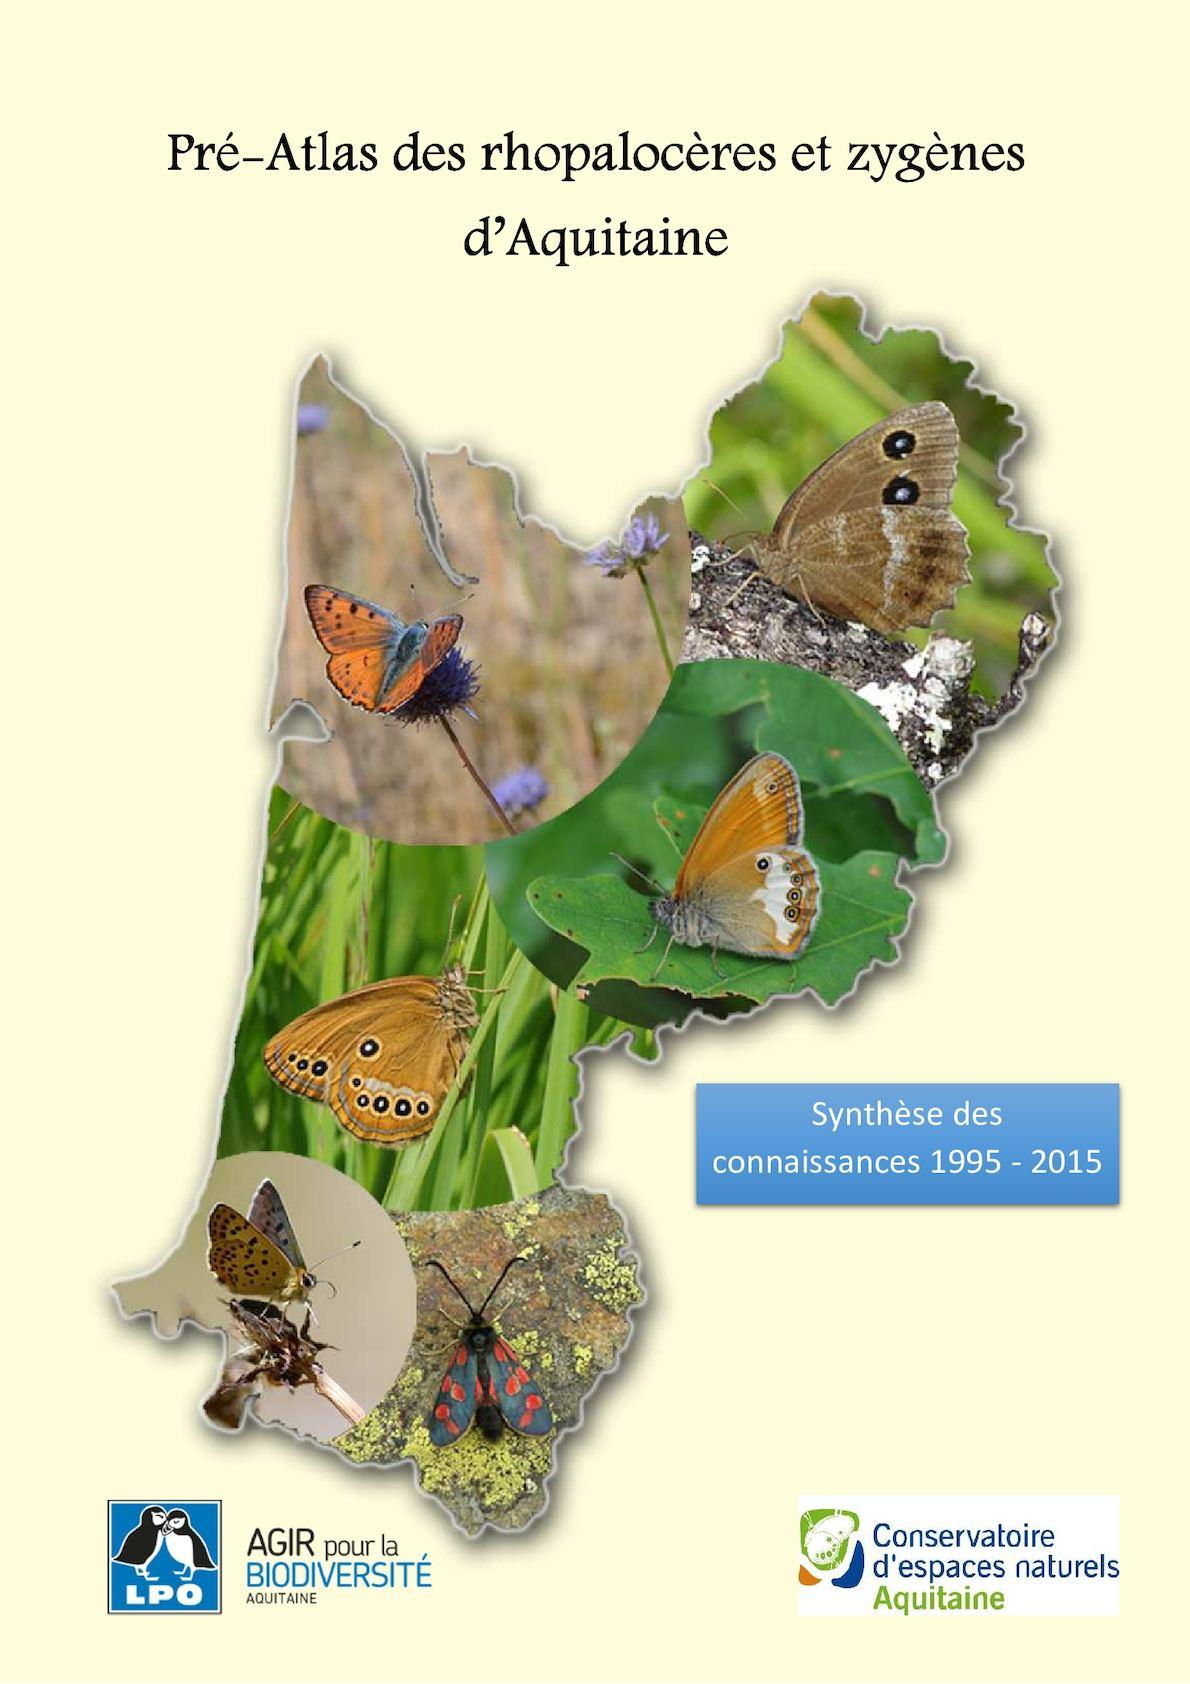 Pre Atlas Rhopaloceres Zygenes Aquitaine Cen Lpo 20161112